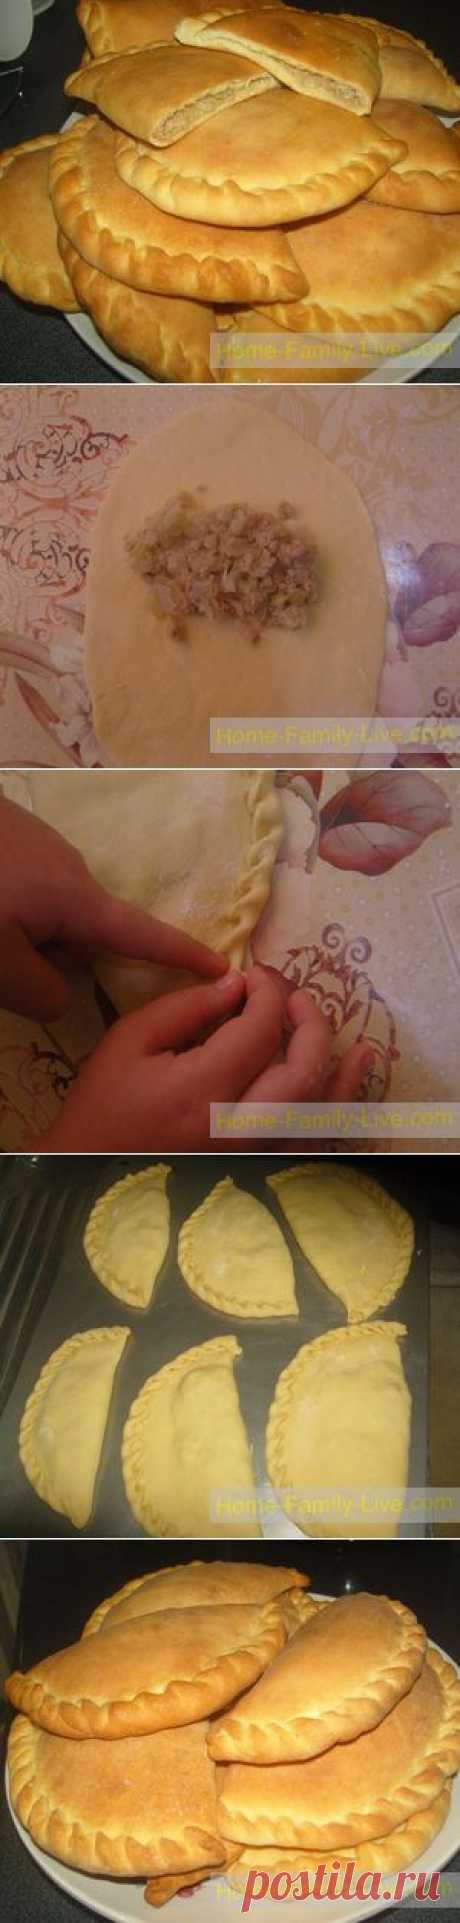 Бабушкины пирожки - Кулинарные рецепты